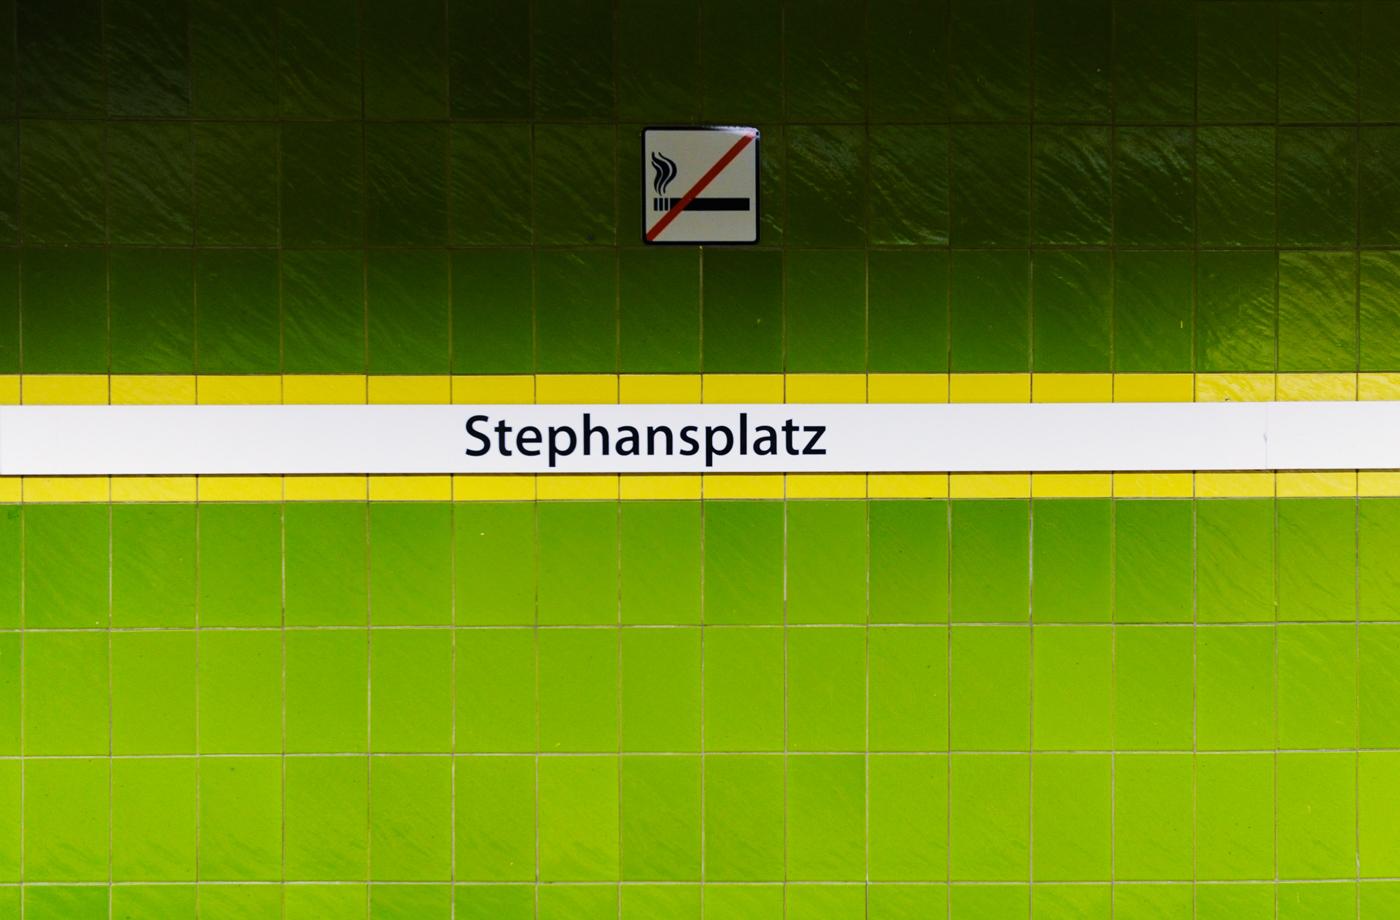 Stephansplatz